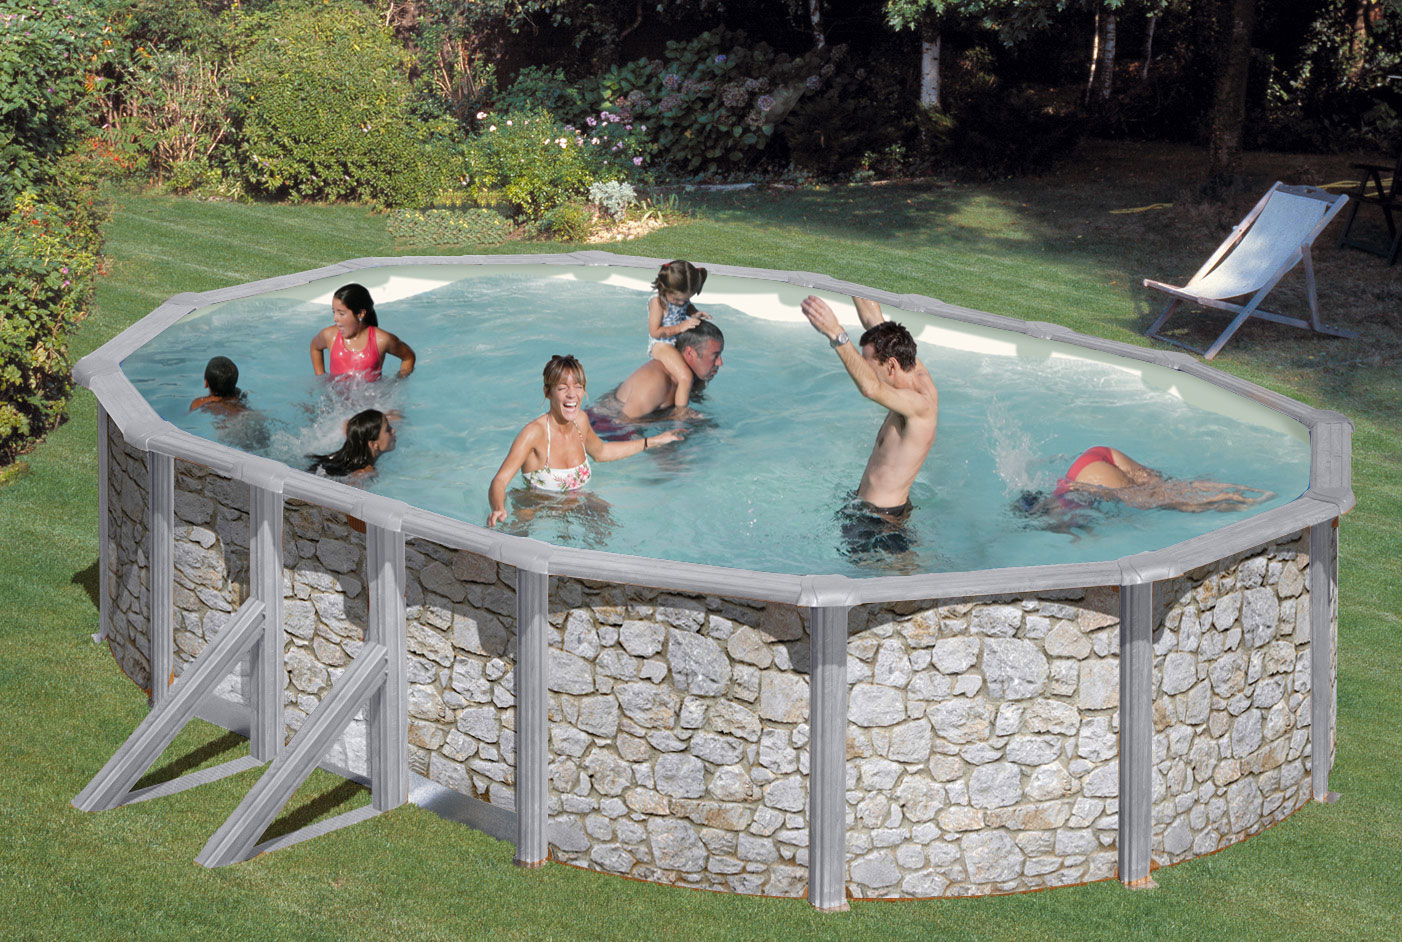 pool schwimmbecken feeling steinoptik oval sandfilter 6 1x3 75x1 20m bei. Black Bedroom Furniture Sets. Home Design Ideas